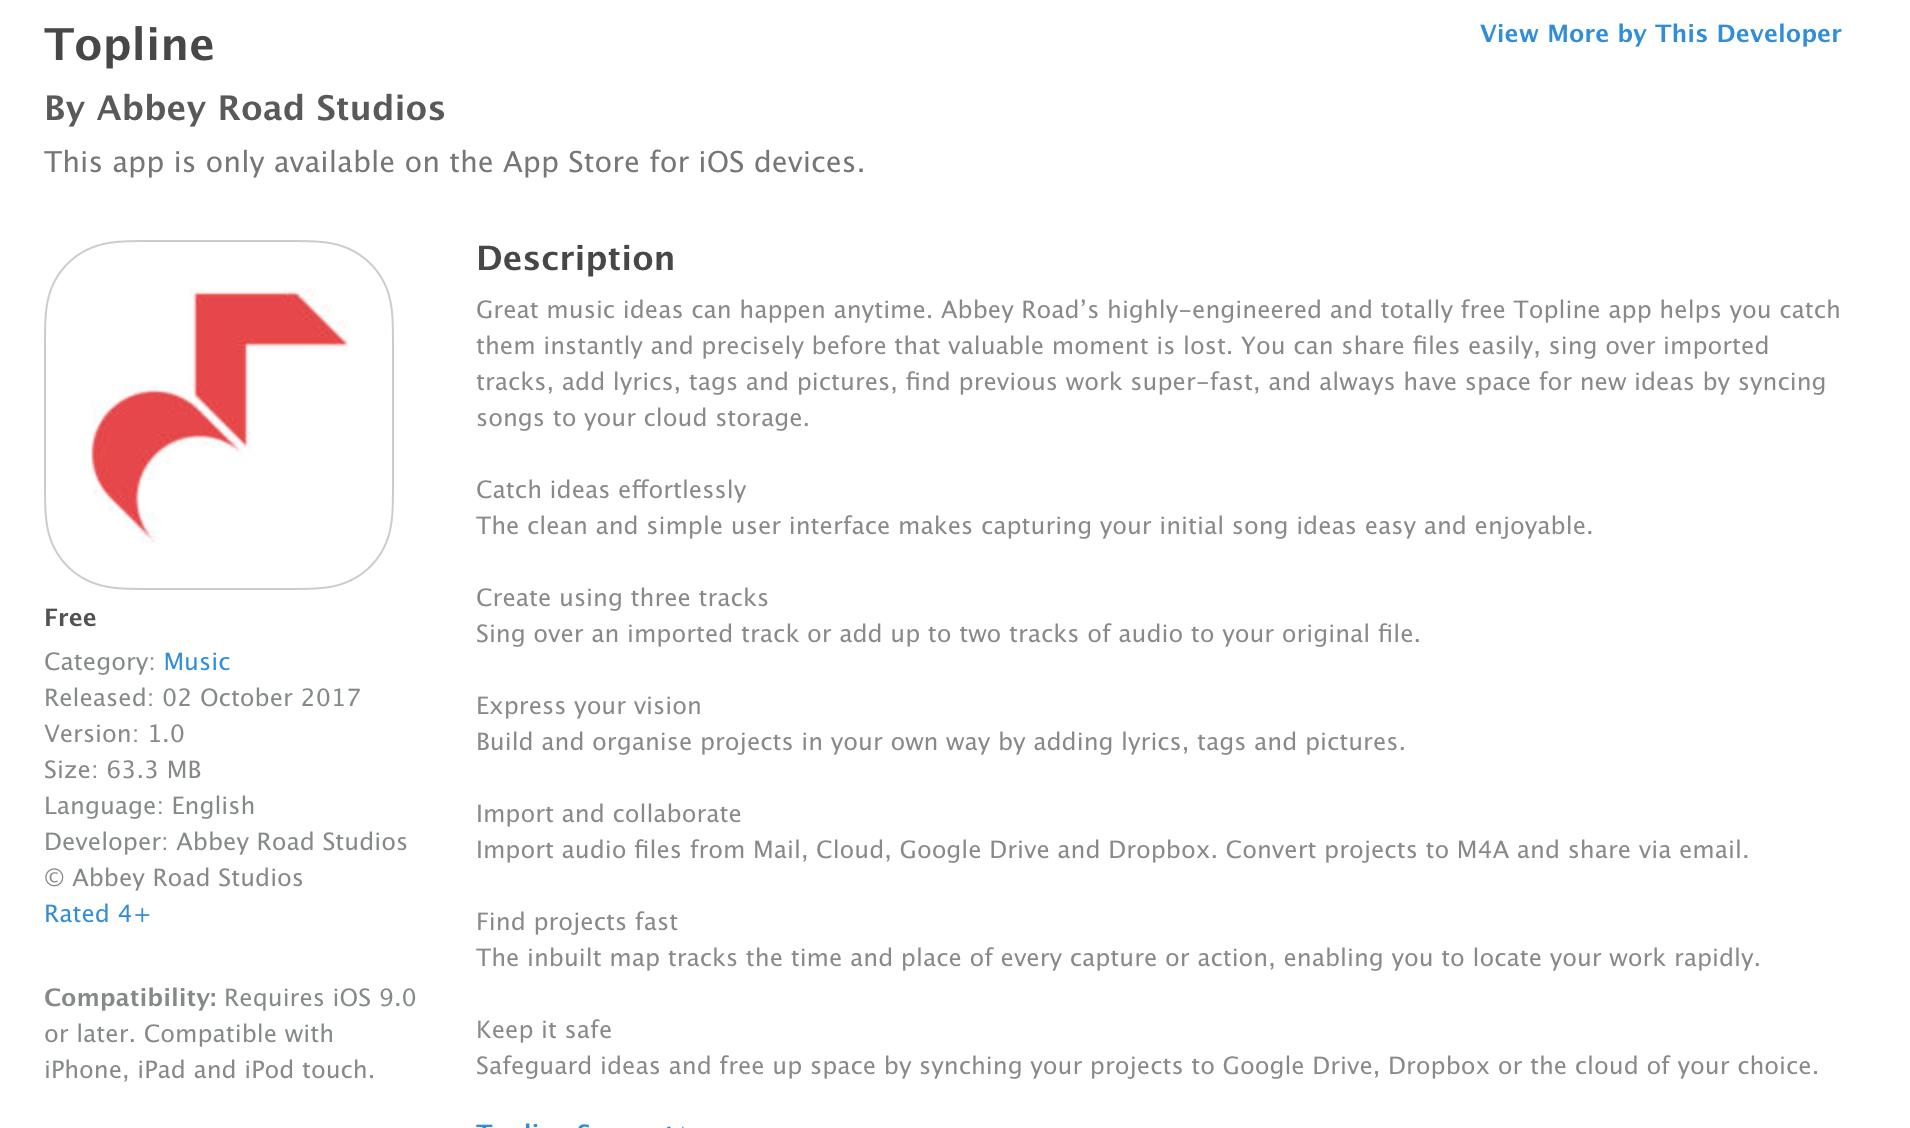 Topline app from Abbey Road Studios — Audiobus Forum